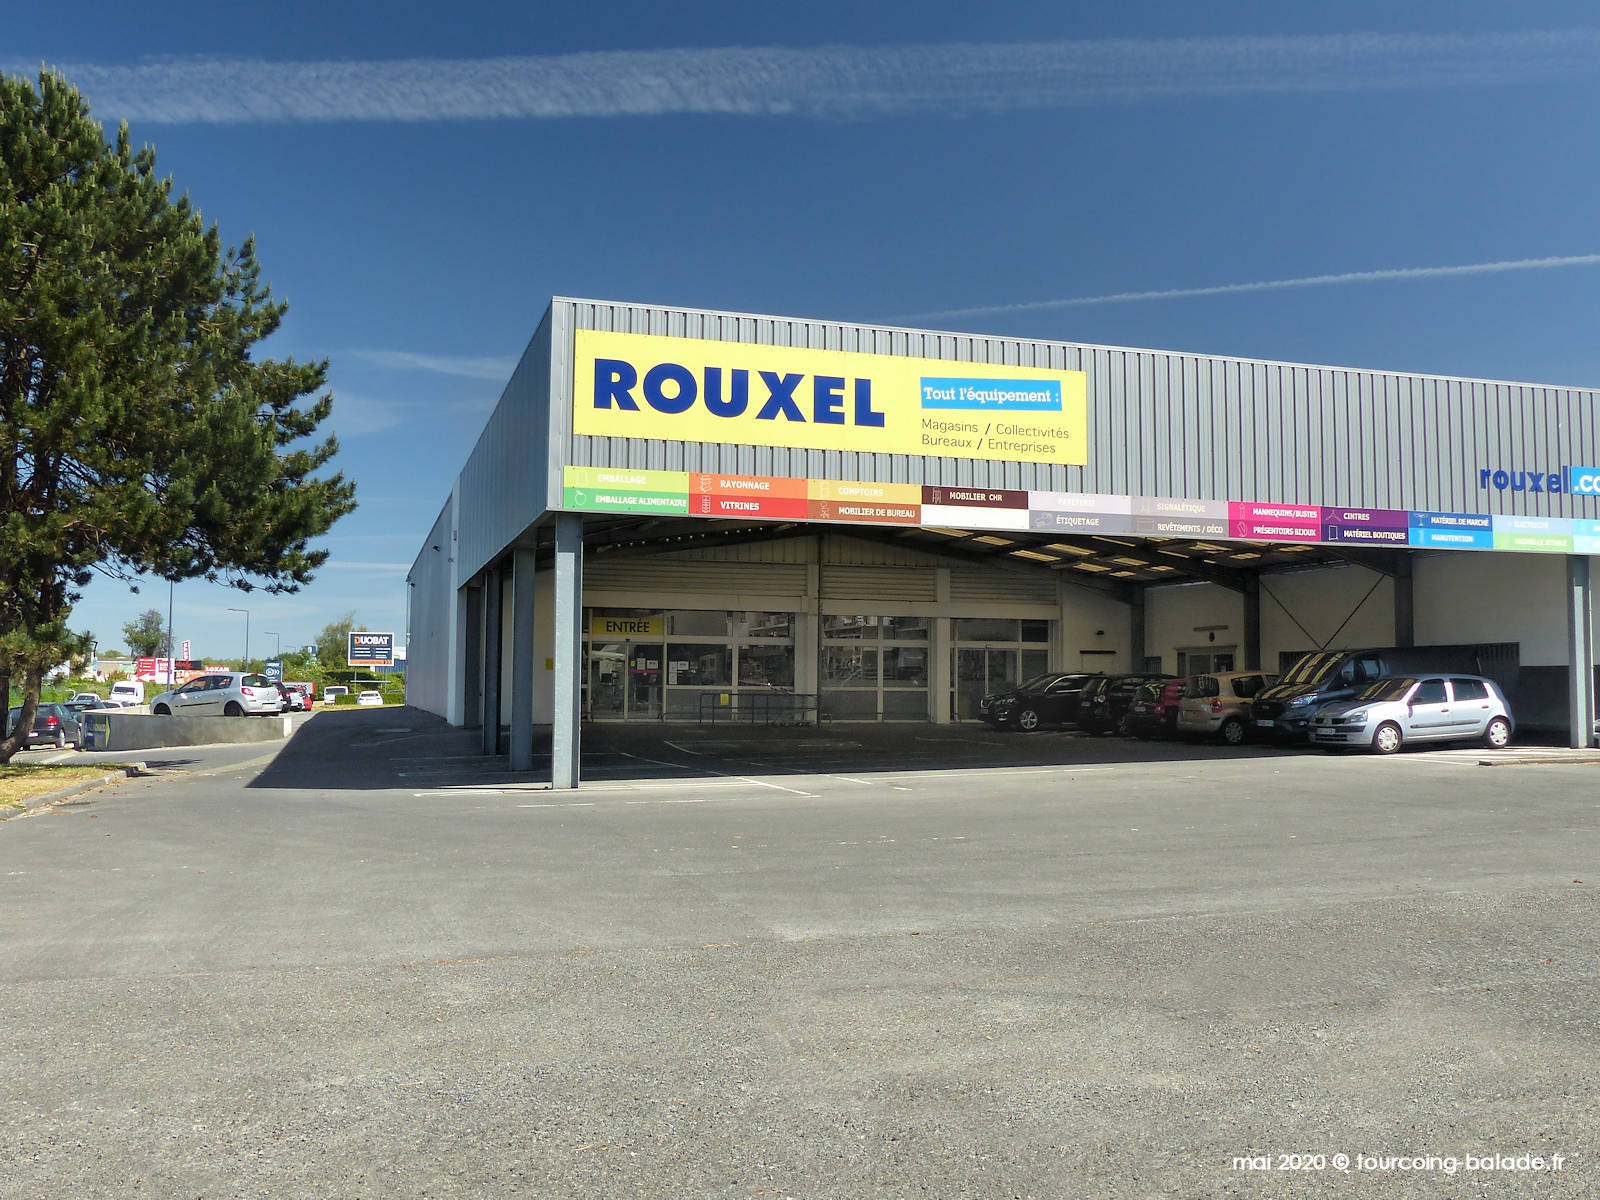 Rouxel Marcq-en-Baroeul, 2020